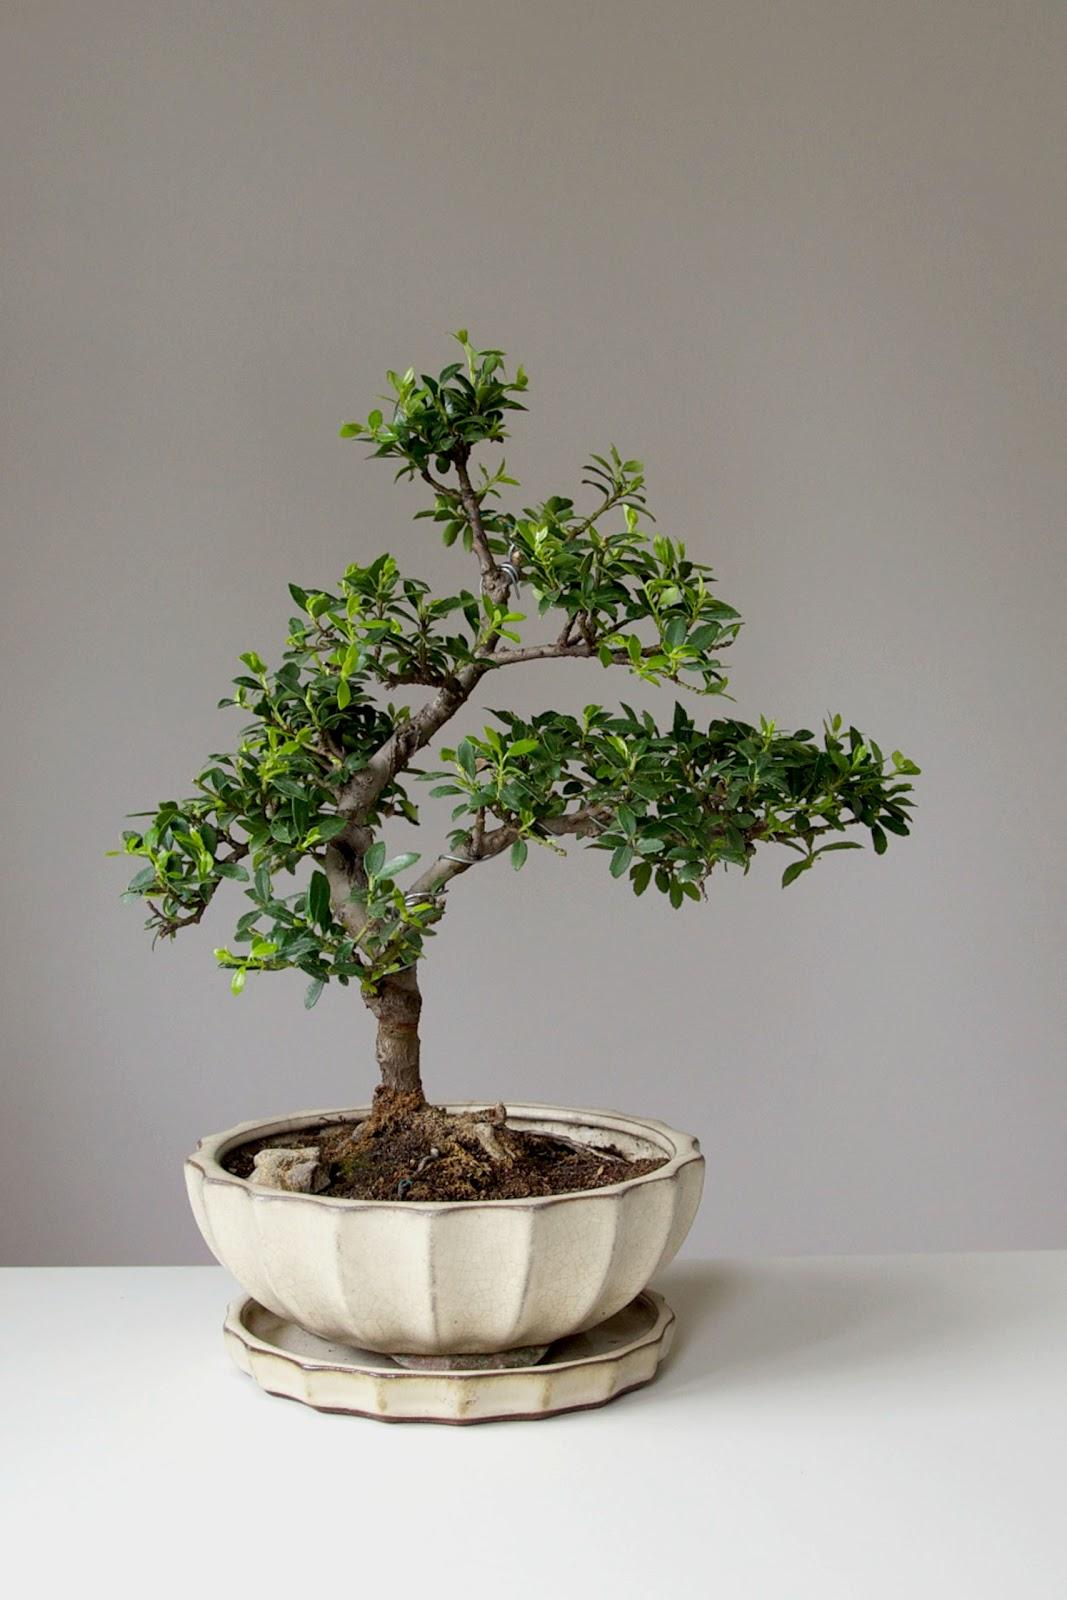 pin bonsai ilex holly on pinterest. Black Bedroom Furniture Sets. Home Design Ideas